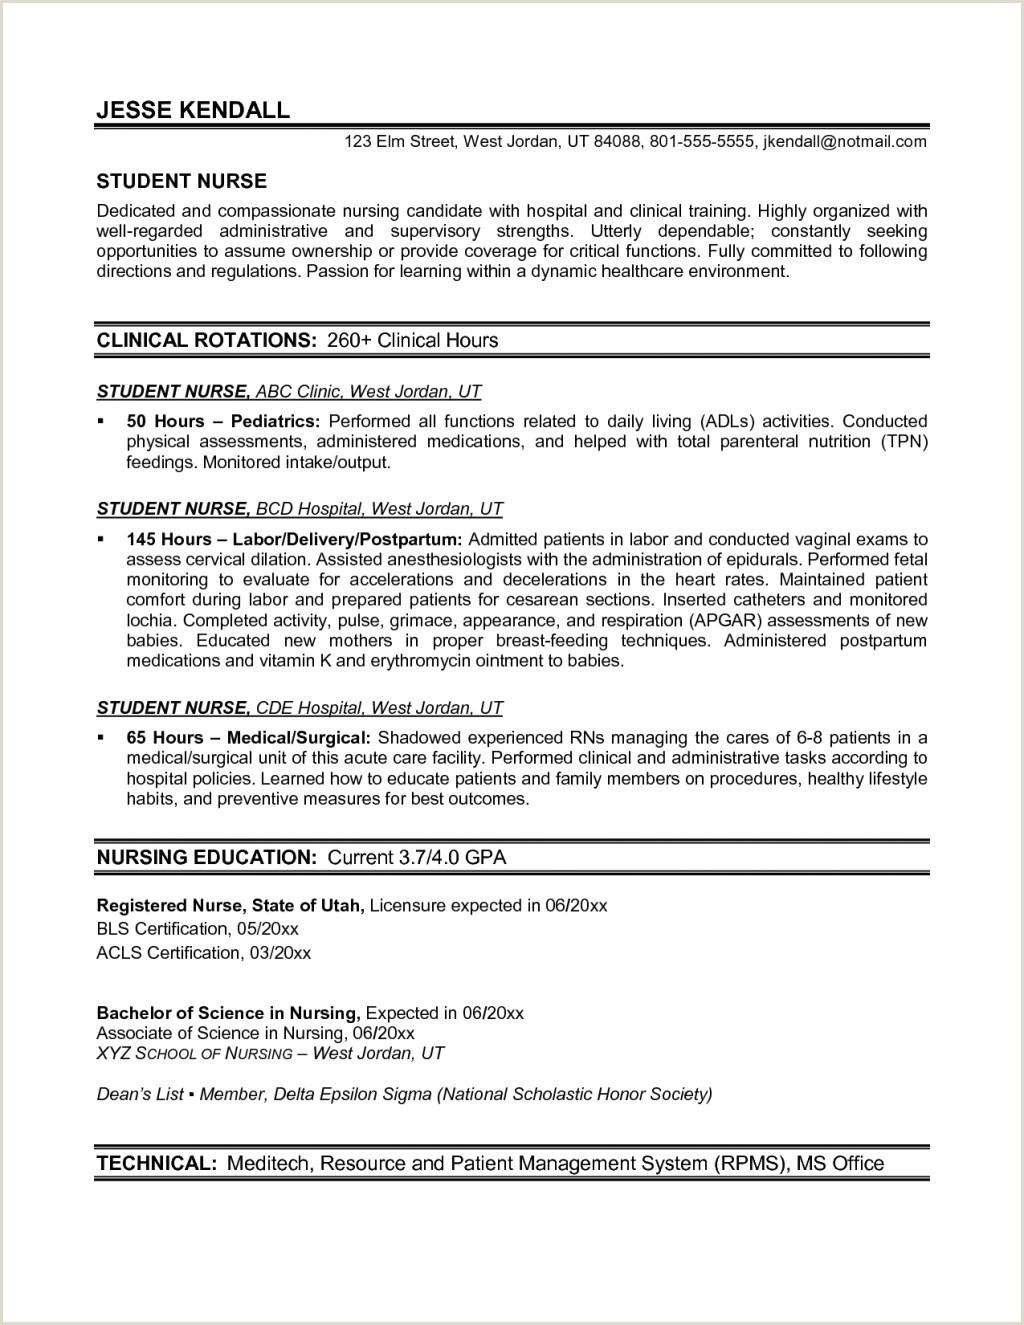 Nursing Resume Samples – Kizi games